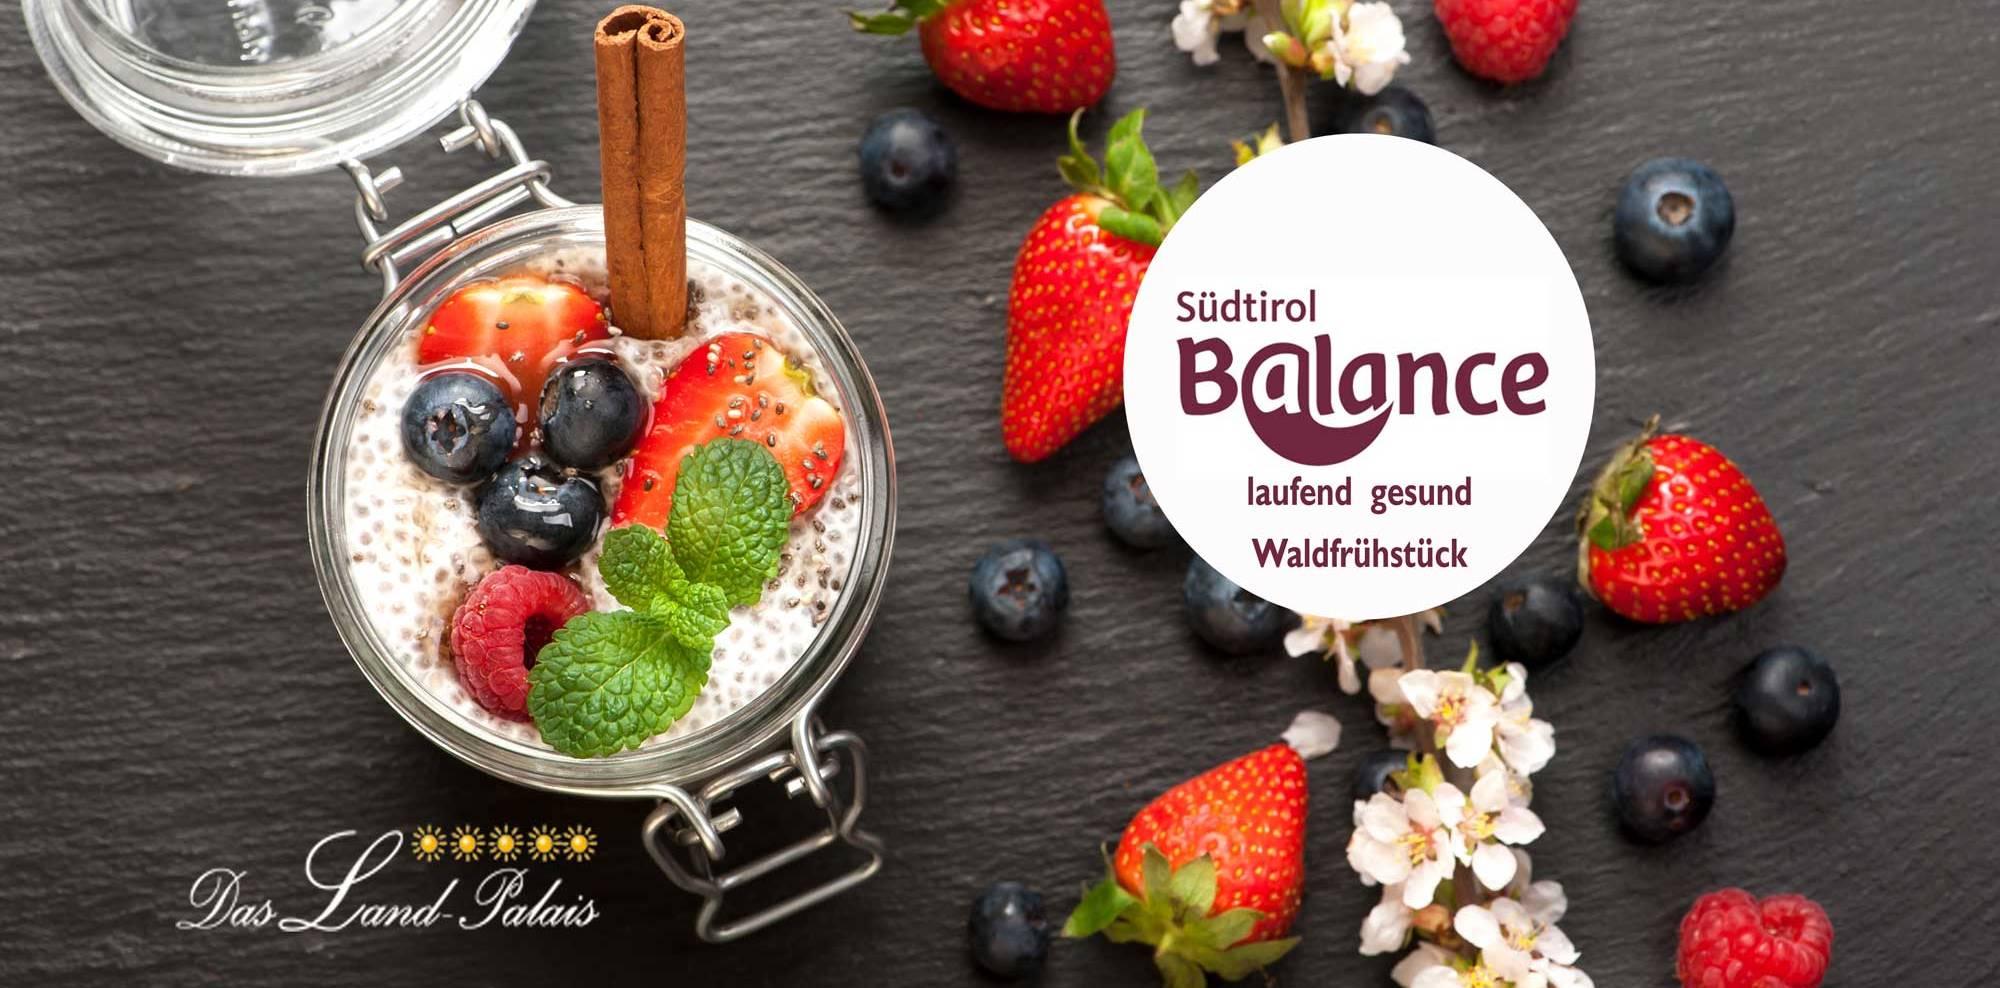 Laufend gesund – Südtirol Balance Mai/Juni 2017